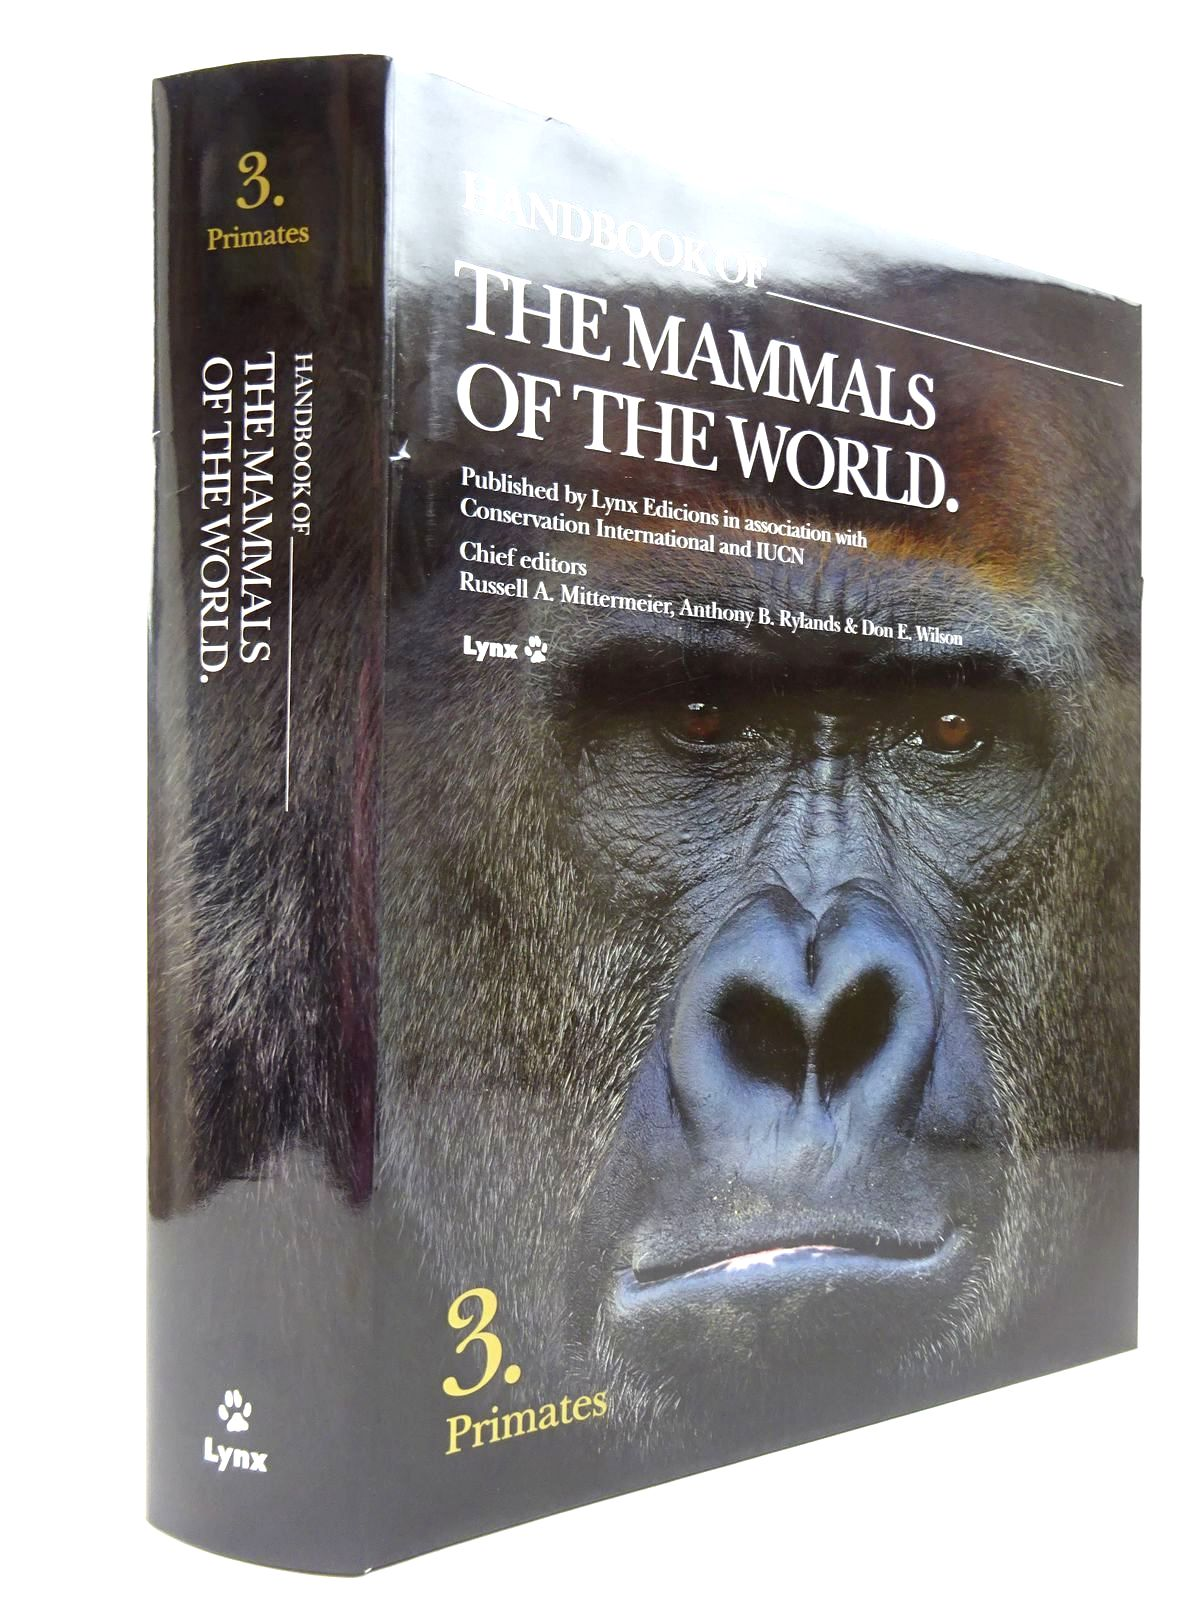 Photo of HANDBOOK OF THE MAMMALS OF THE WORLD 3. PRIMATES